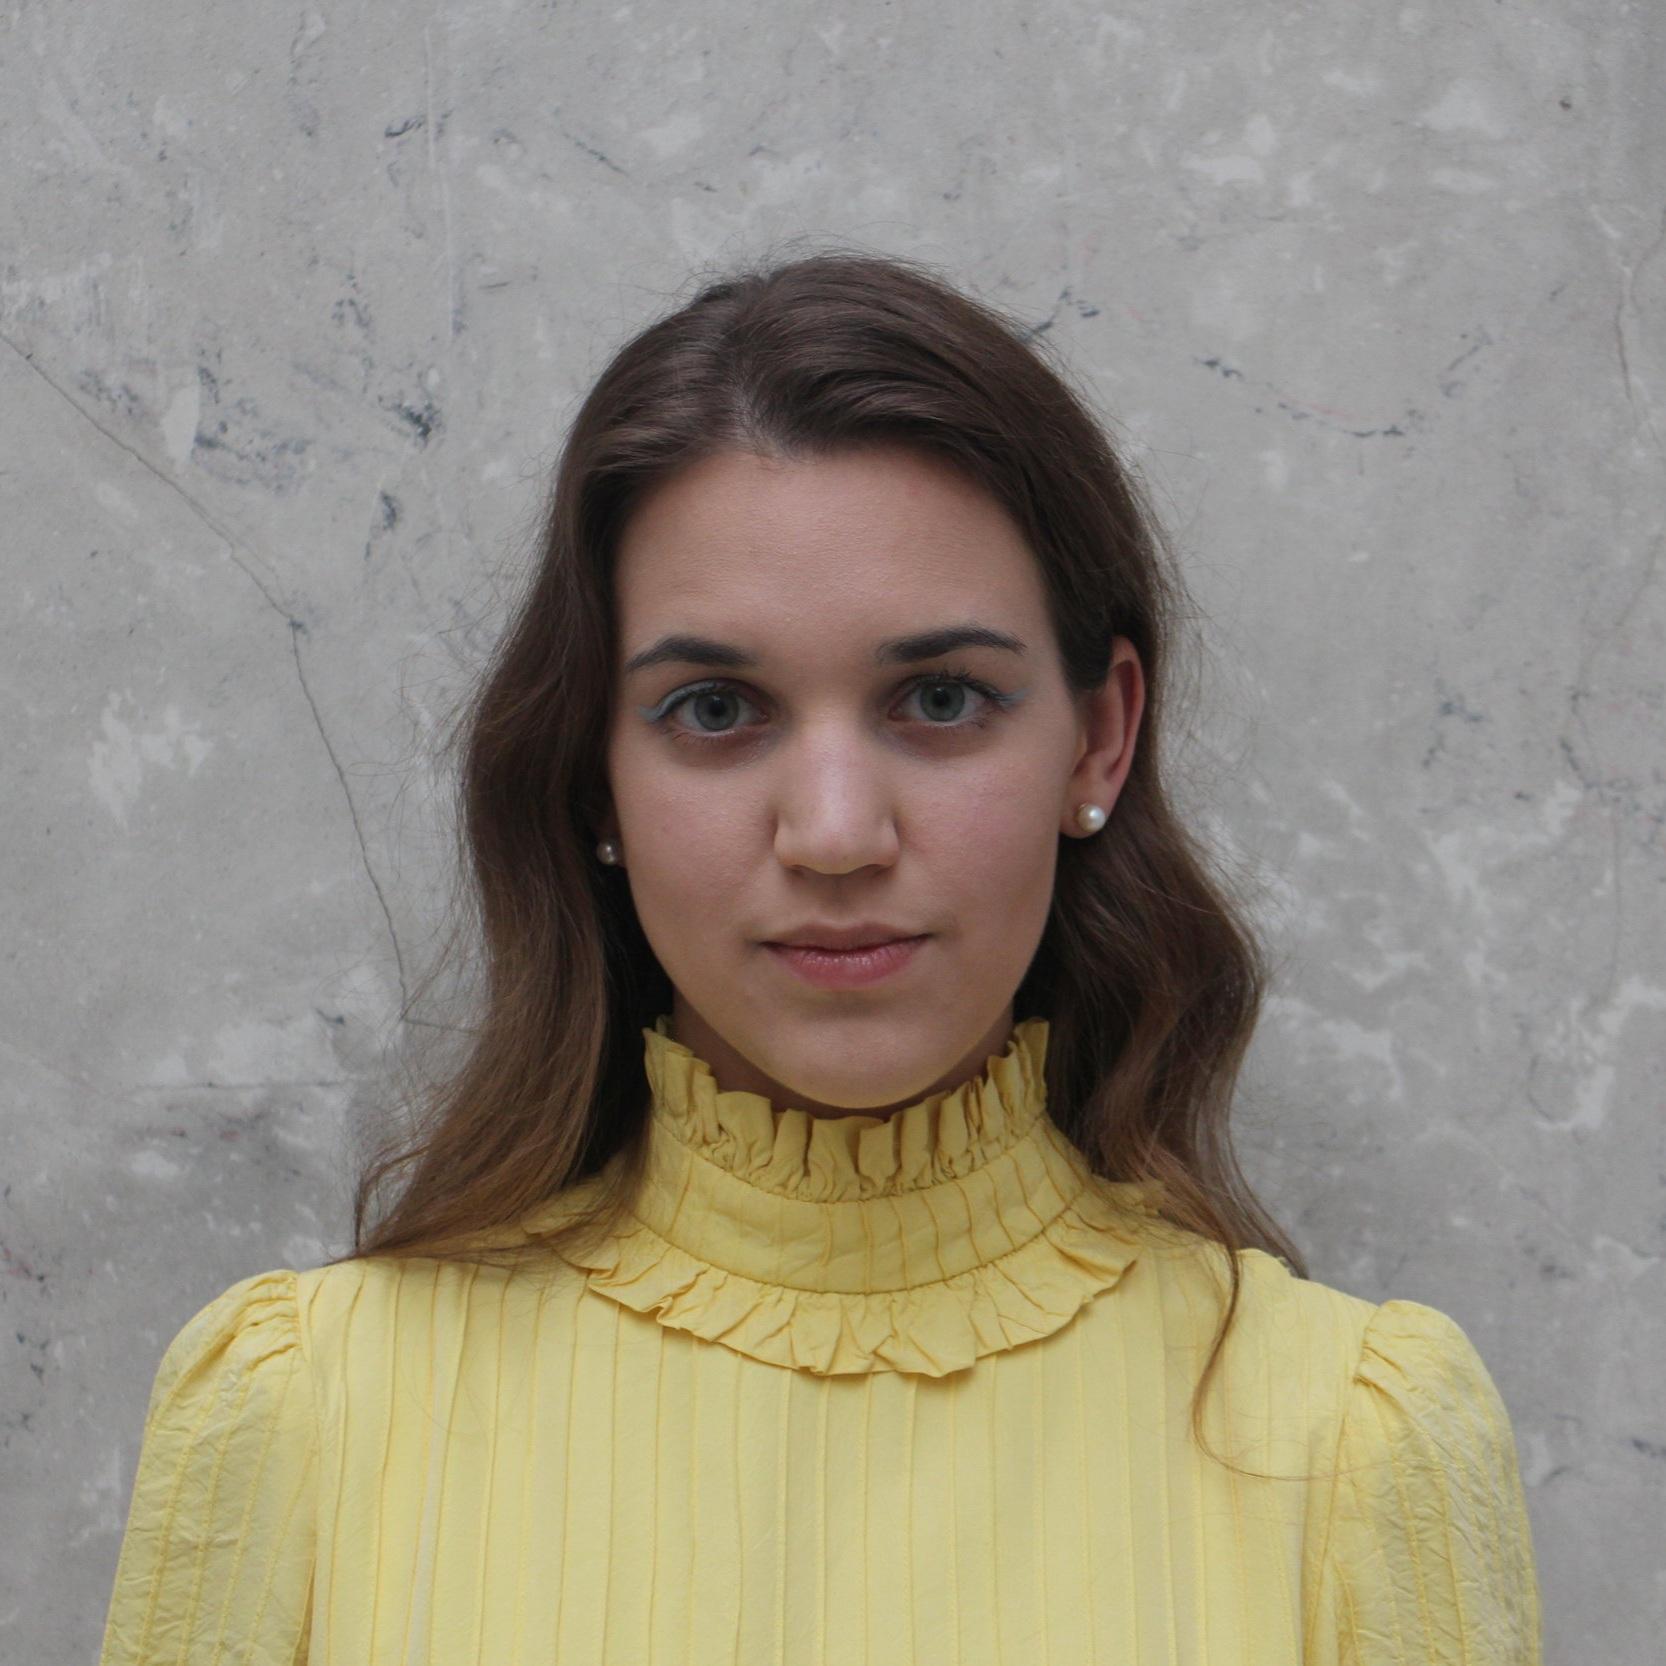 Safikhanova+-+Photo+3.jpg